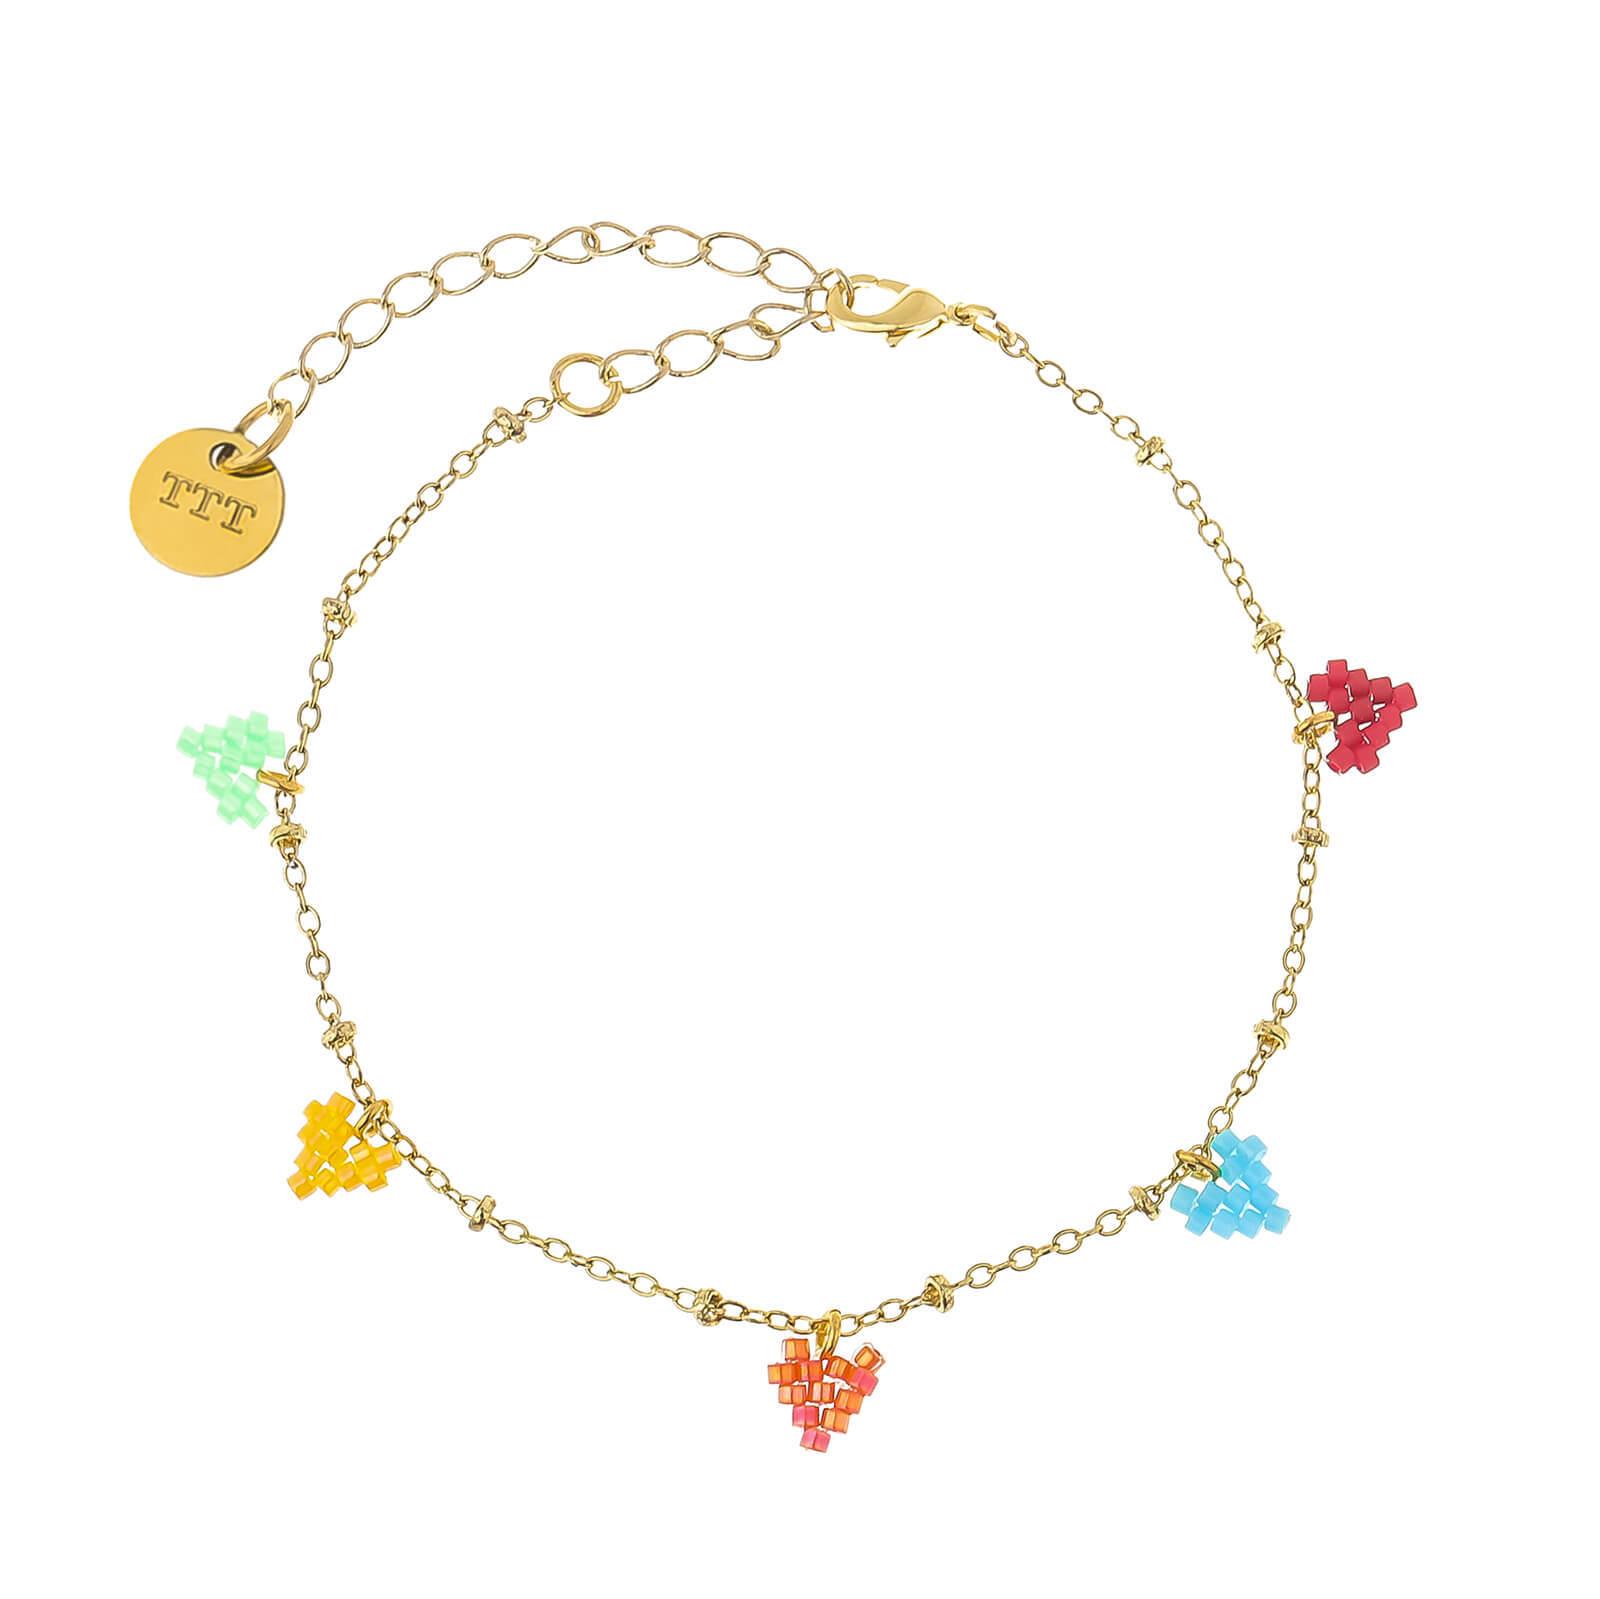 Handmade chain seed bead charm bracelet